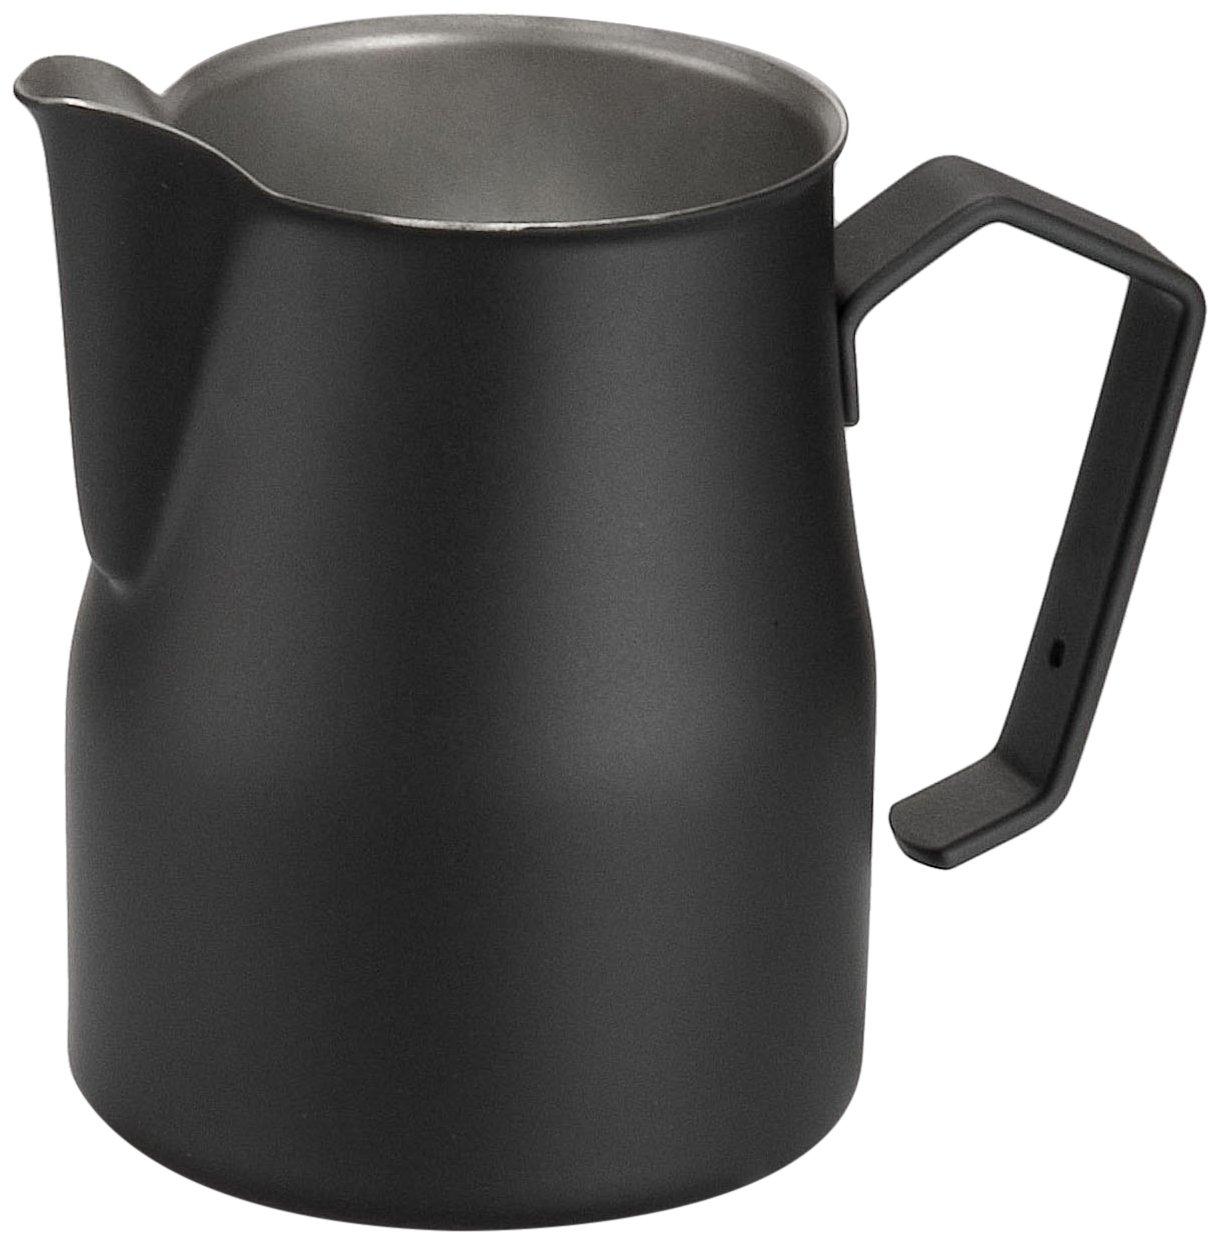 Motta Stainless Steel Professional Milk Pitcher/Jugs, 11.8 Fluid Ounce, Black by Metallurgica Motta